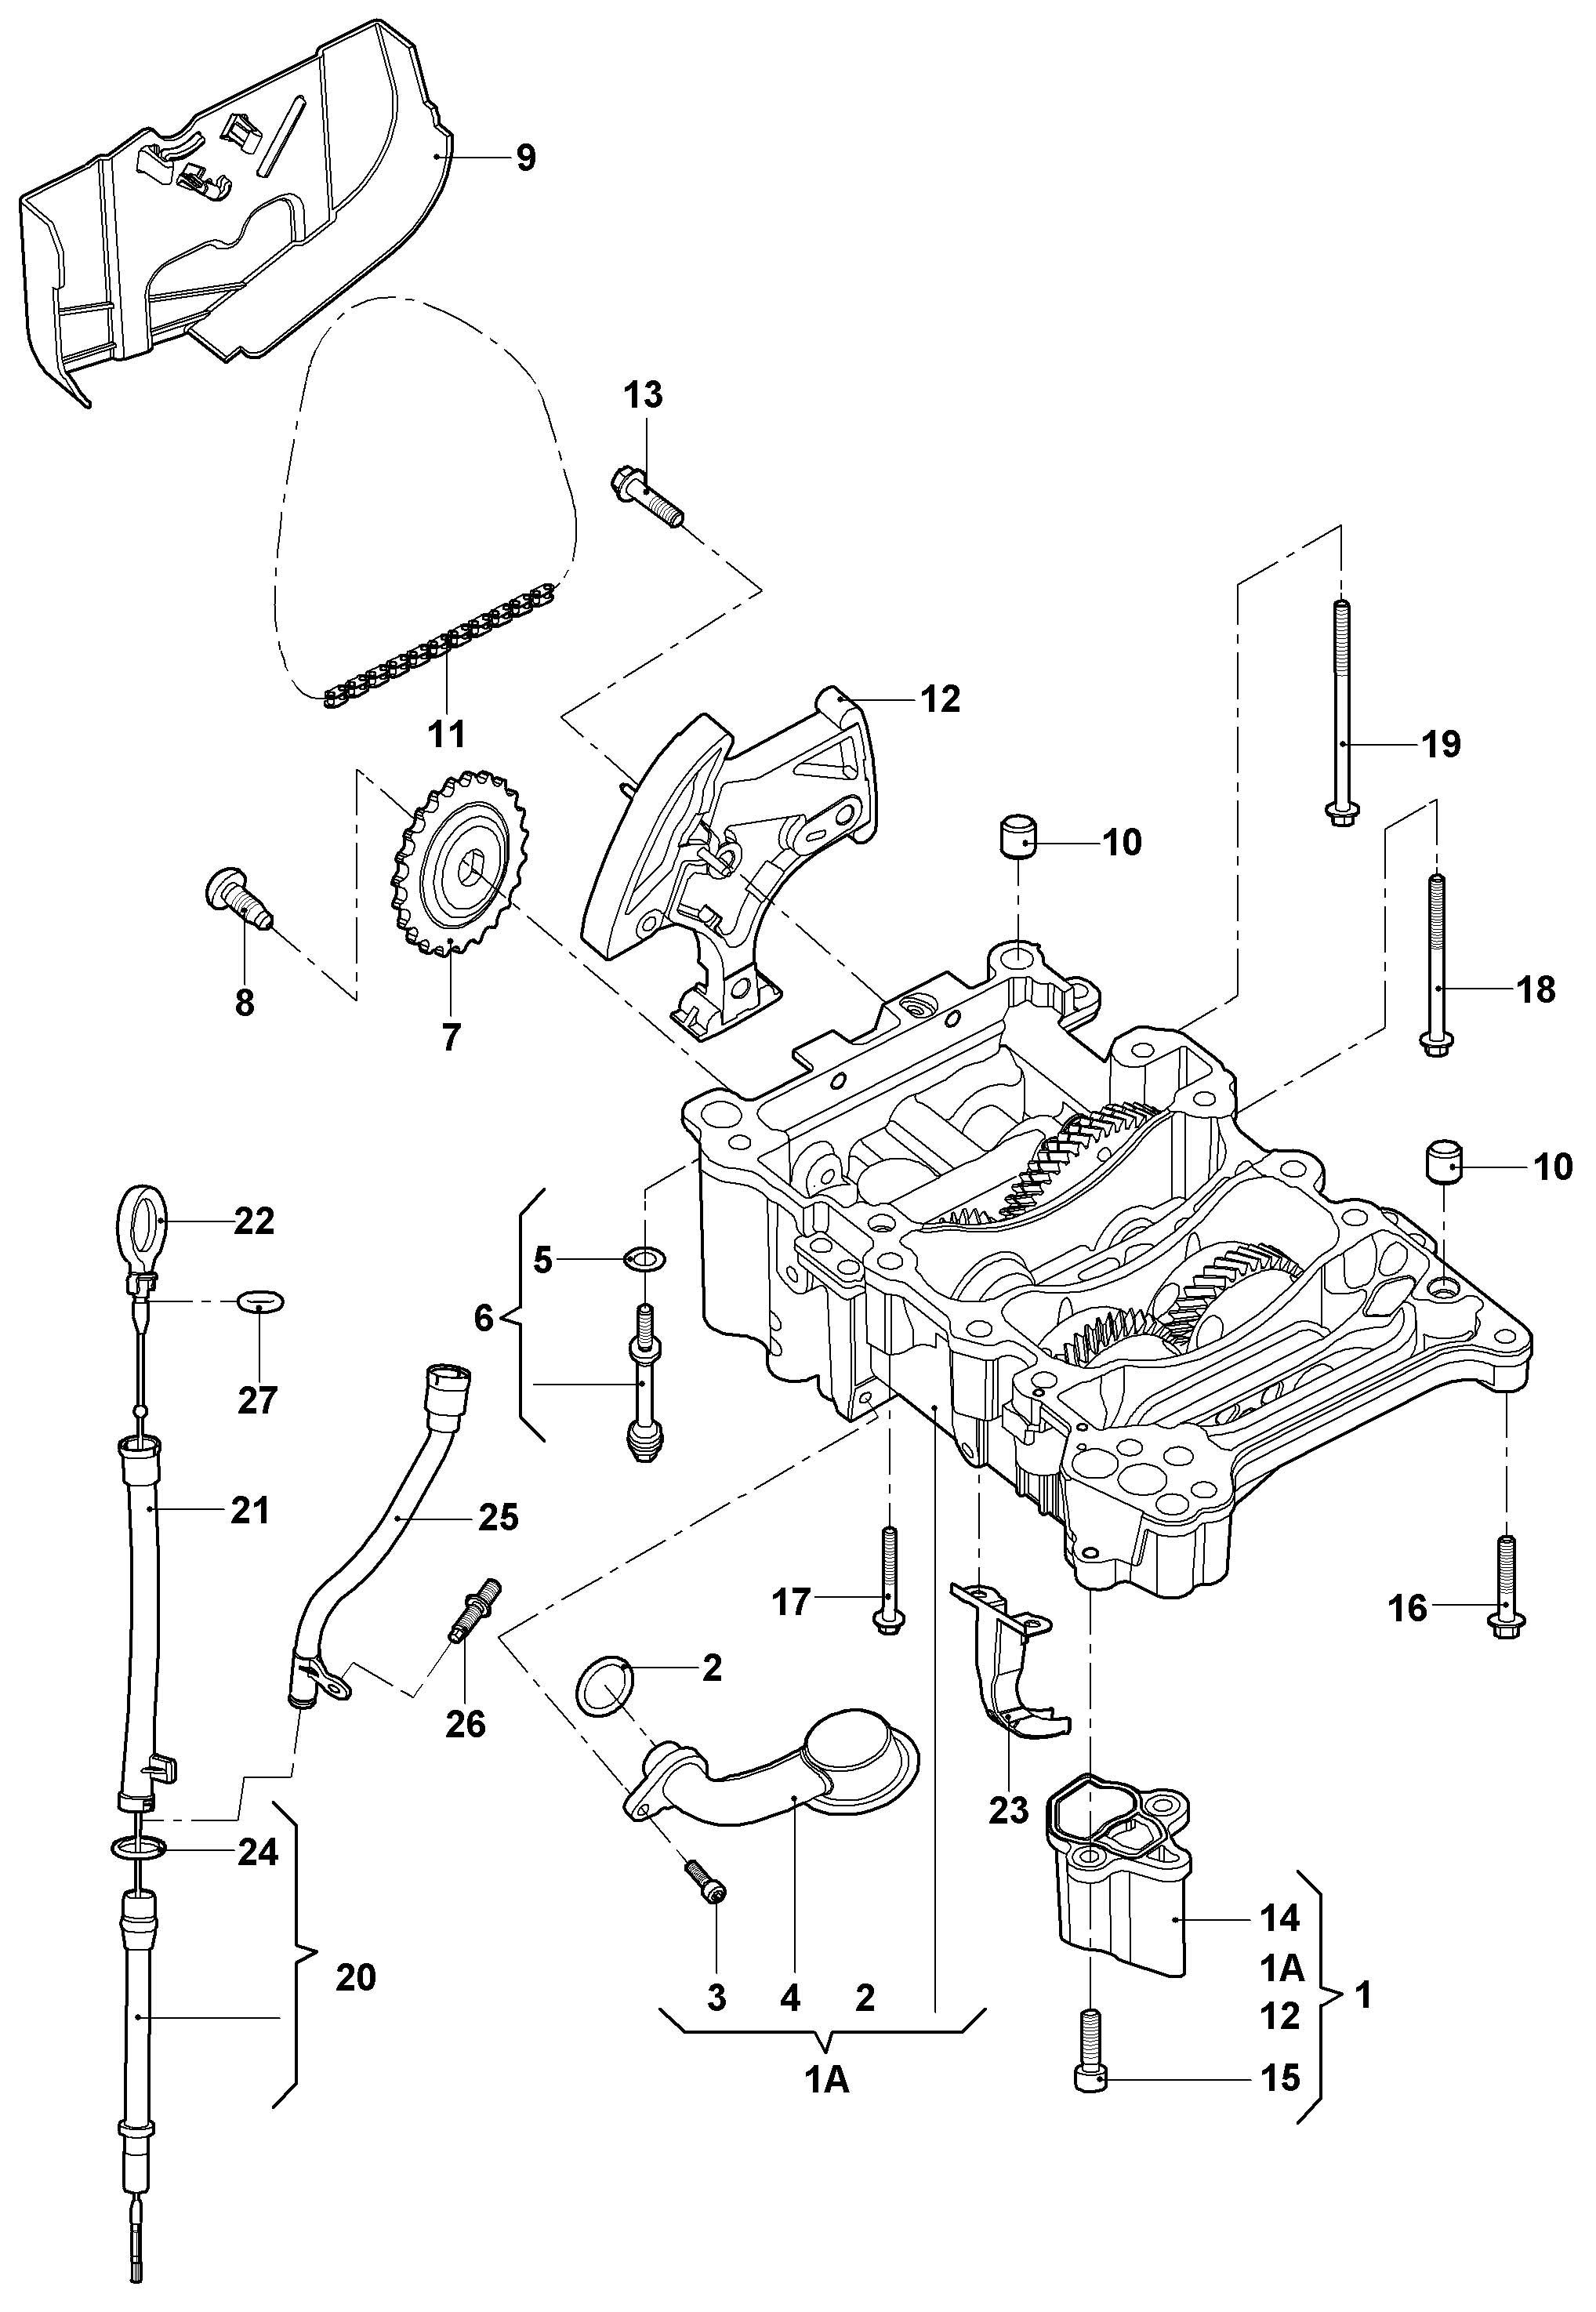 Volkswagen Jetta Suction Pipe Suction Line